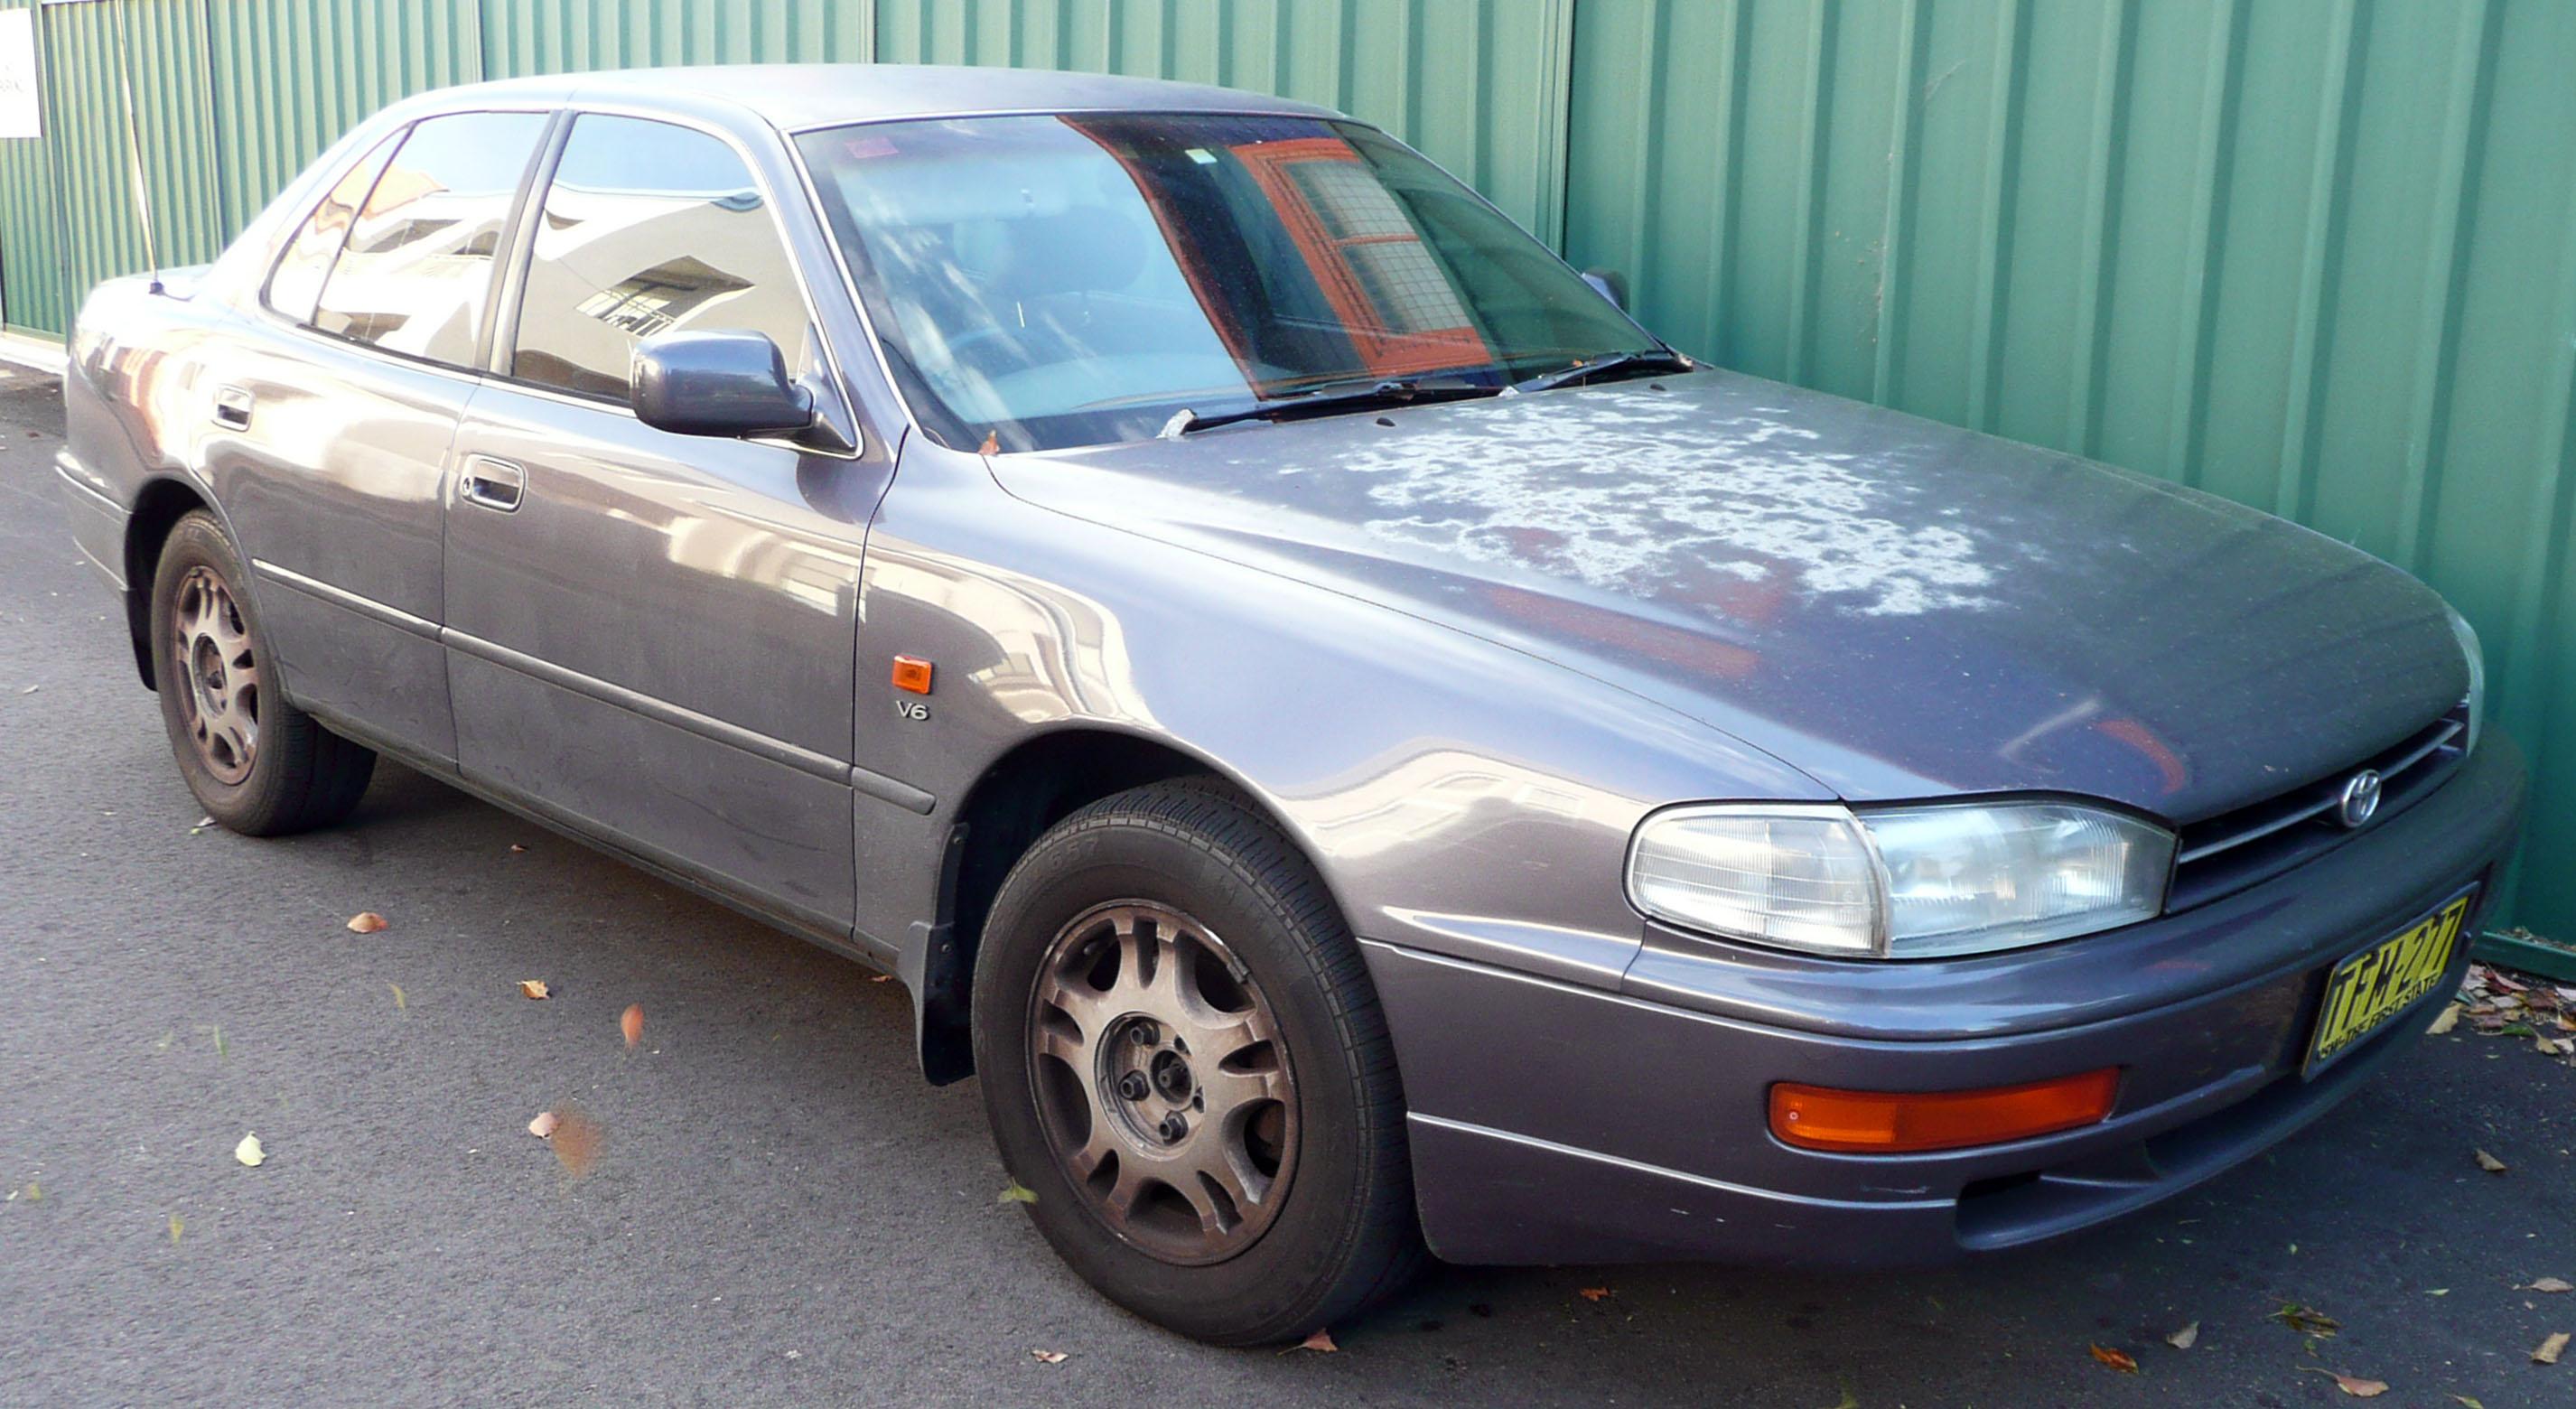 Toyota Ultima >> File:1993-1995 Toyota Camry Vienta (VDV10) Ultima sedan 02 ...